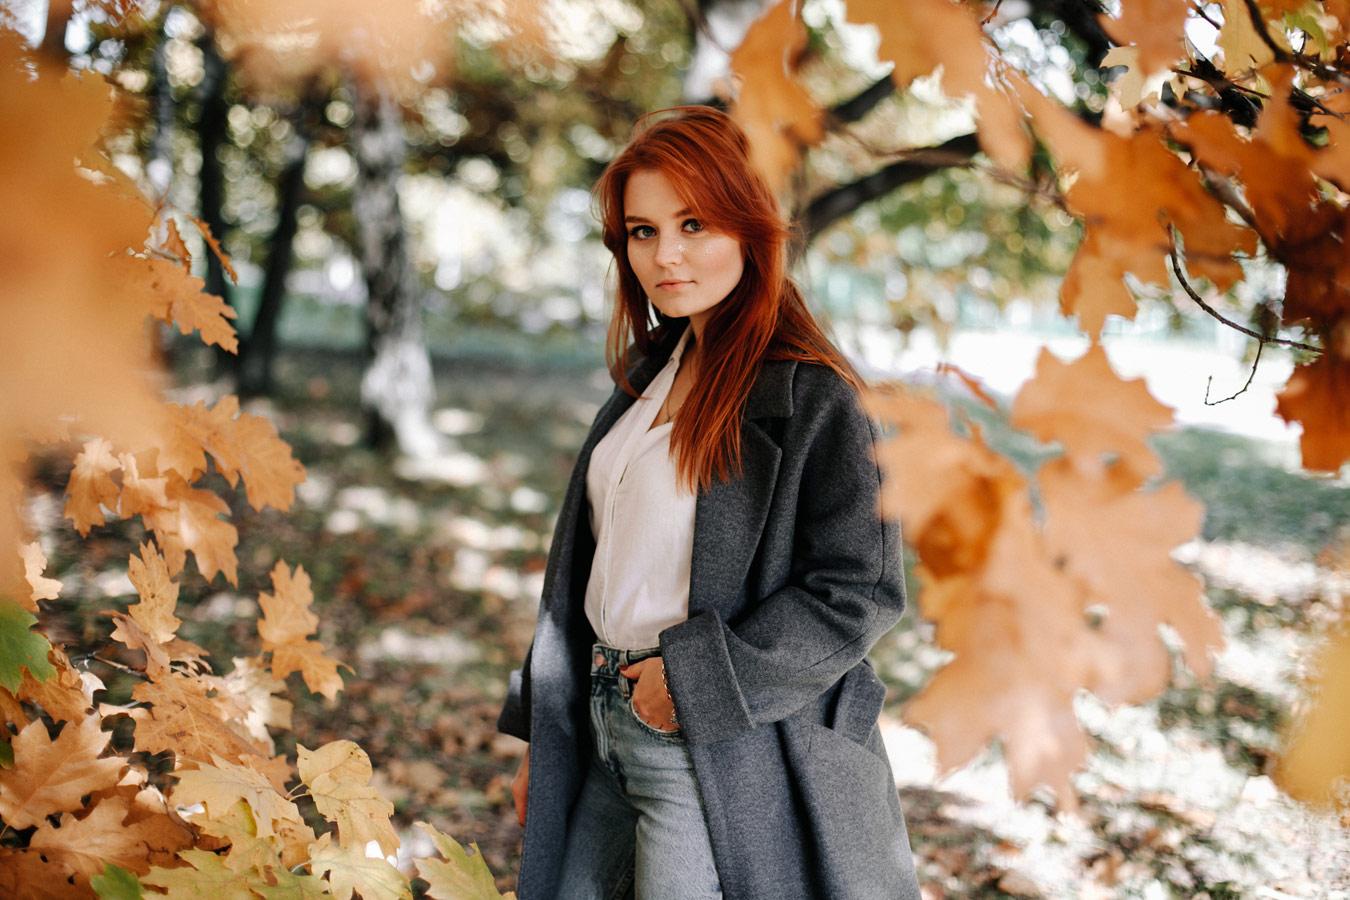 Прогулка, © Masha May, Фотоконкурс «Осенний портрет»